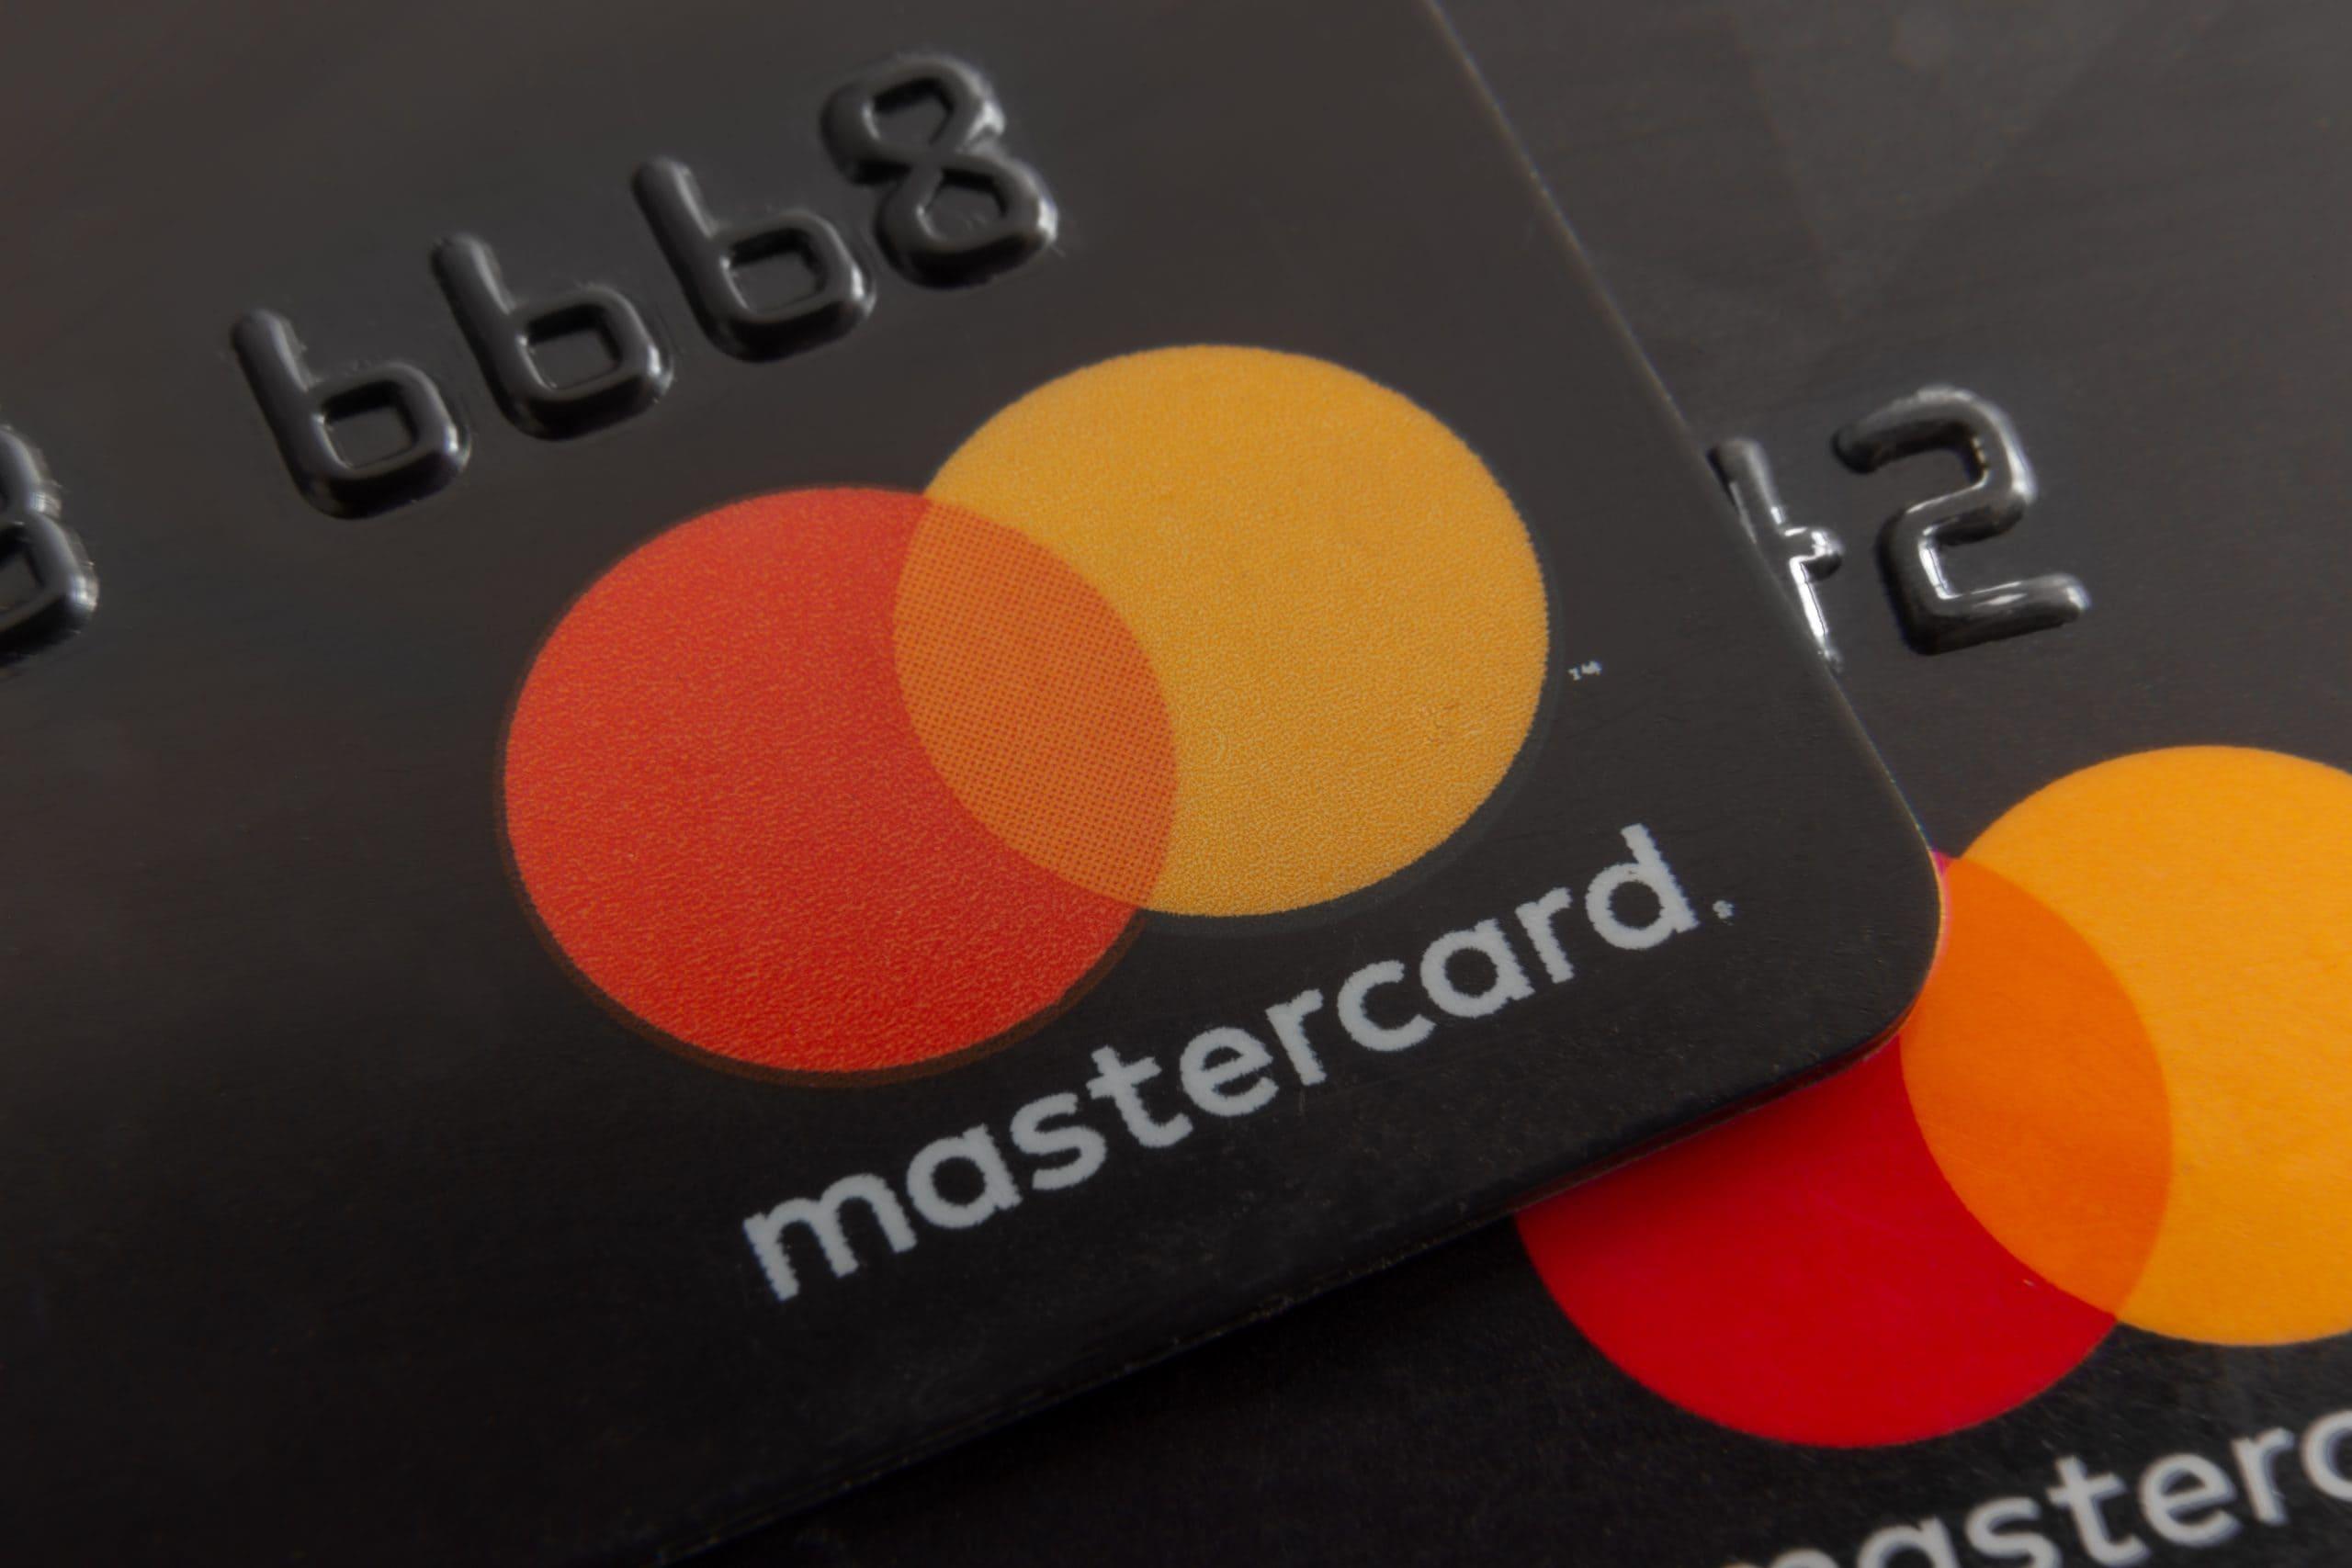 Mastercard integriert Bitcoin und Co.